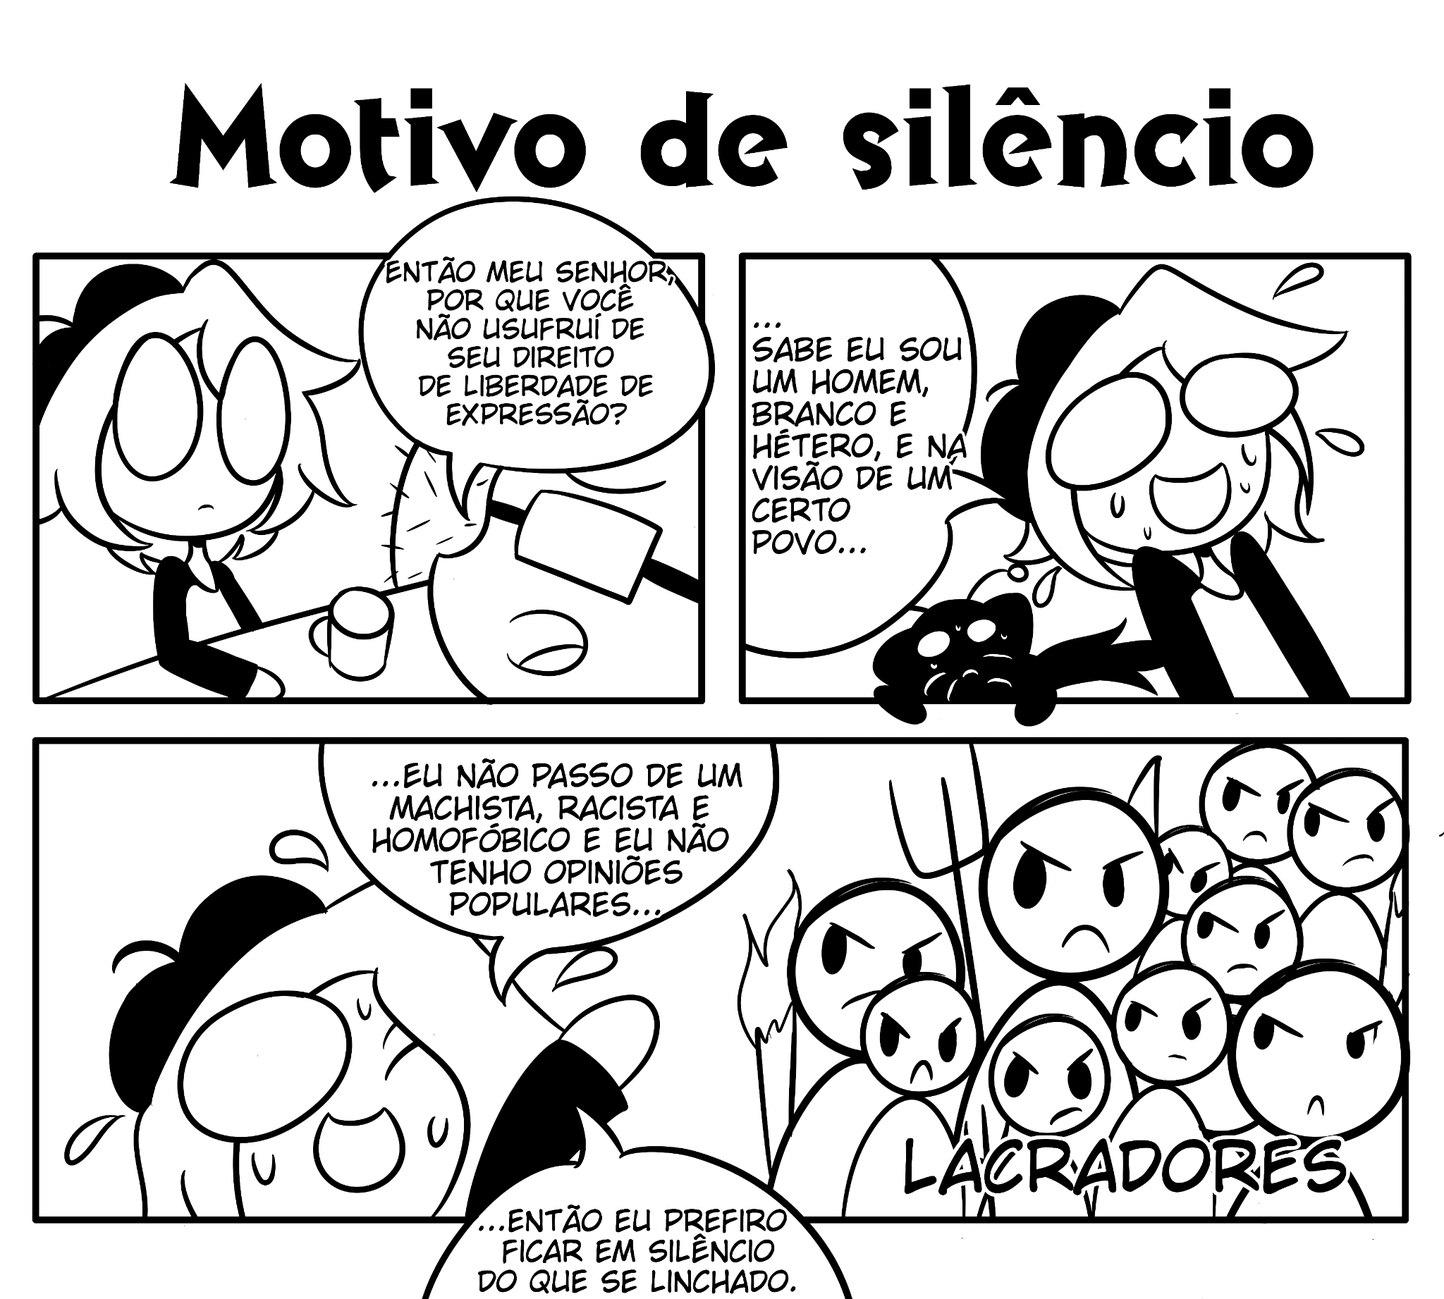 Motivo de silêncio - meme